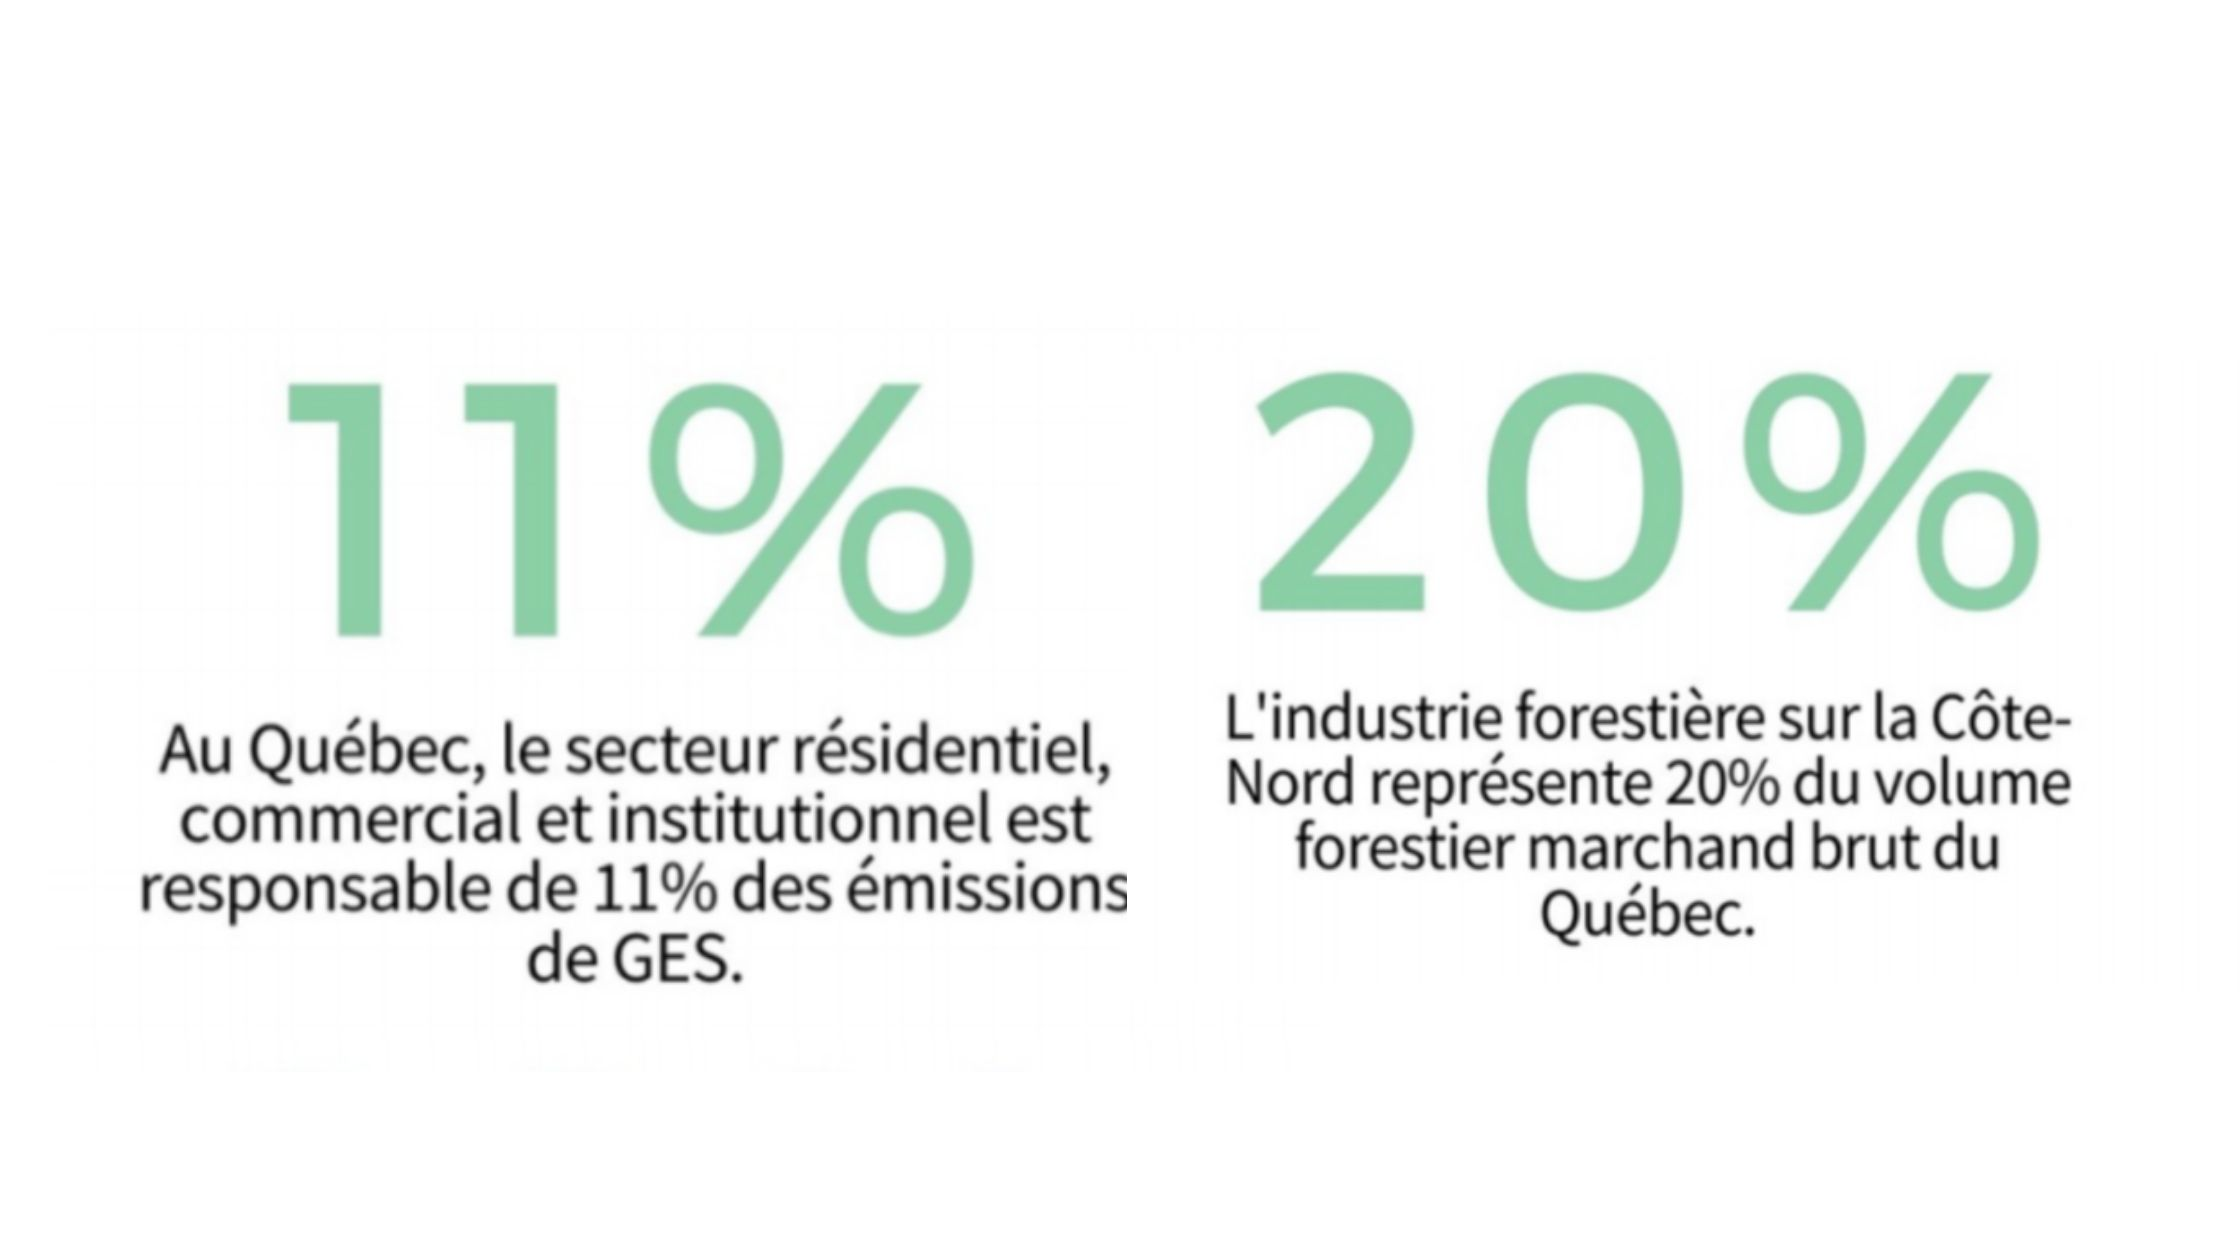 implantation-du-chauffage-a-la-biomasse-forestiere (1)